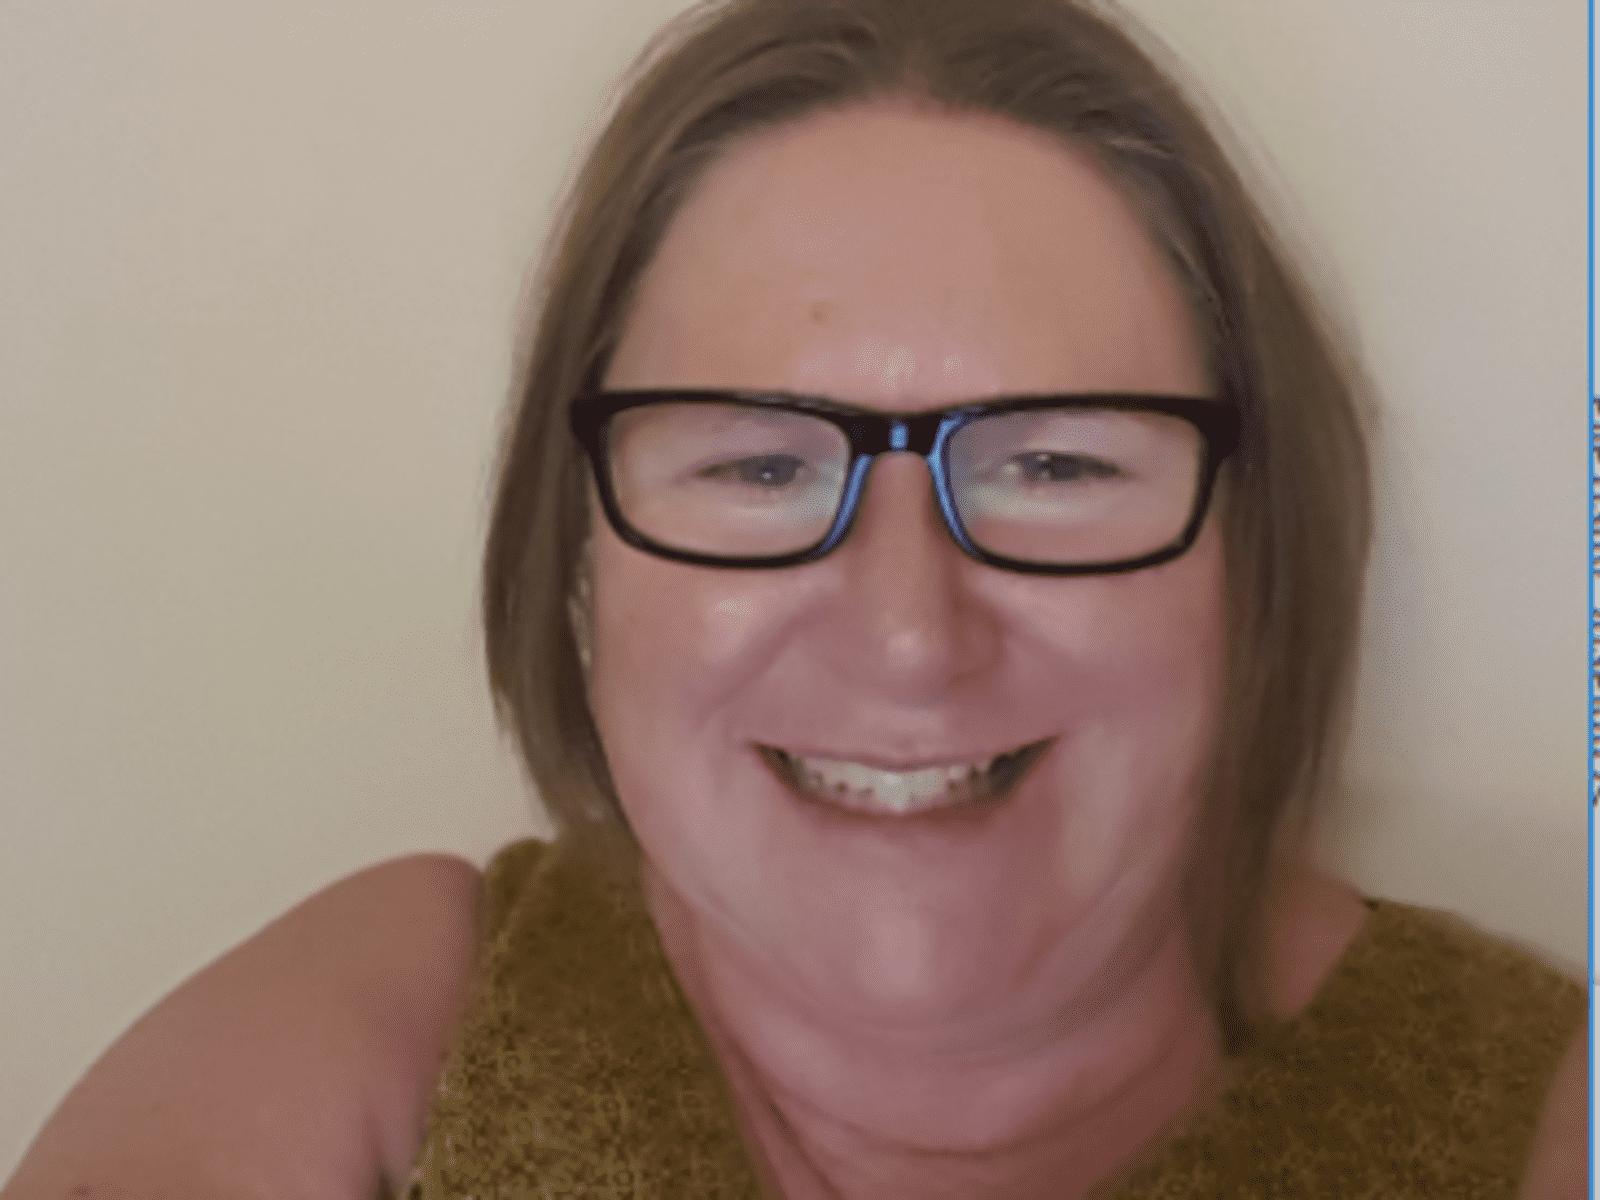 Catherine from Melbourne, Victoria, Australia